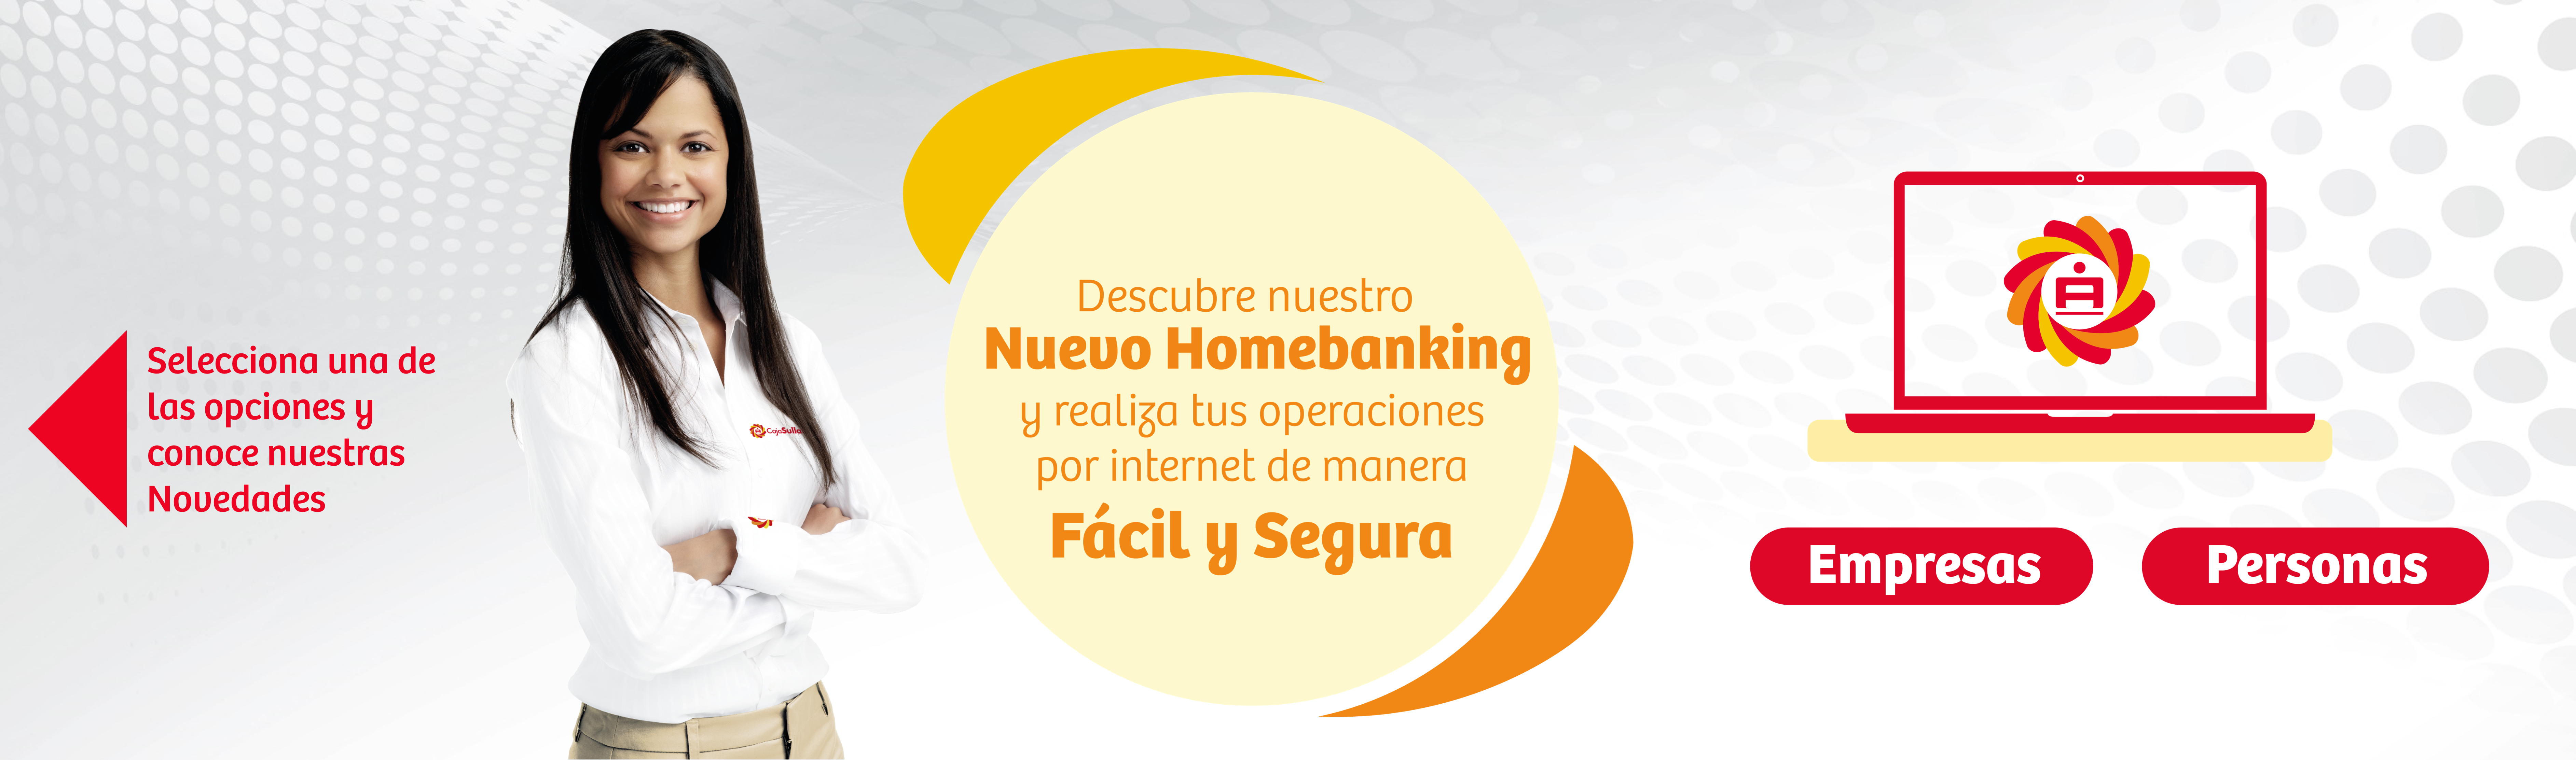 Nuevo Homebanking